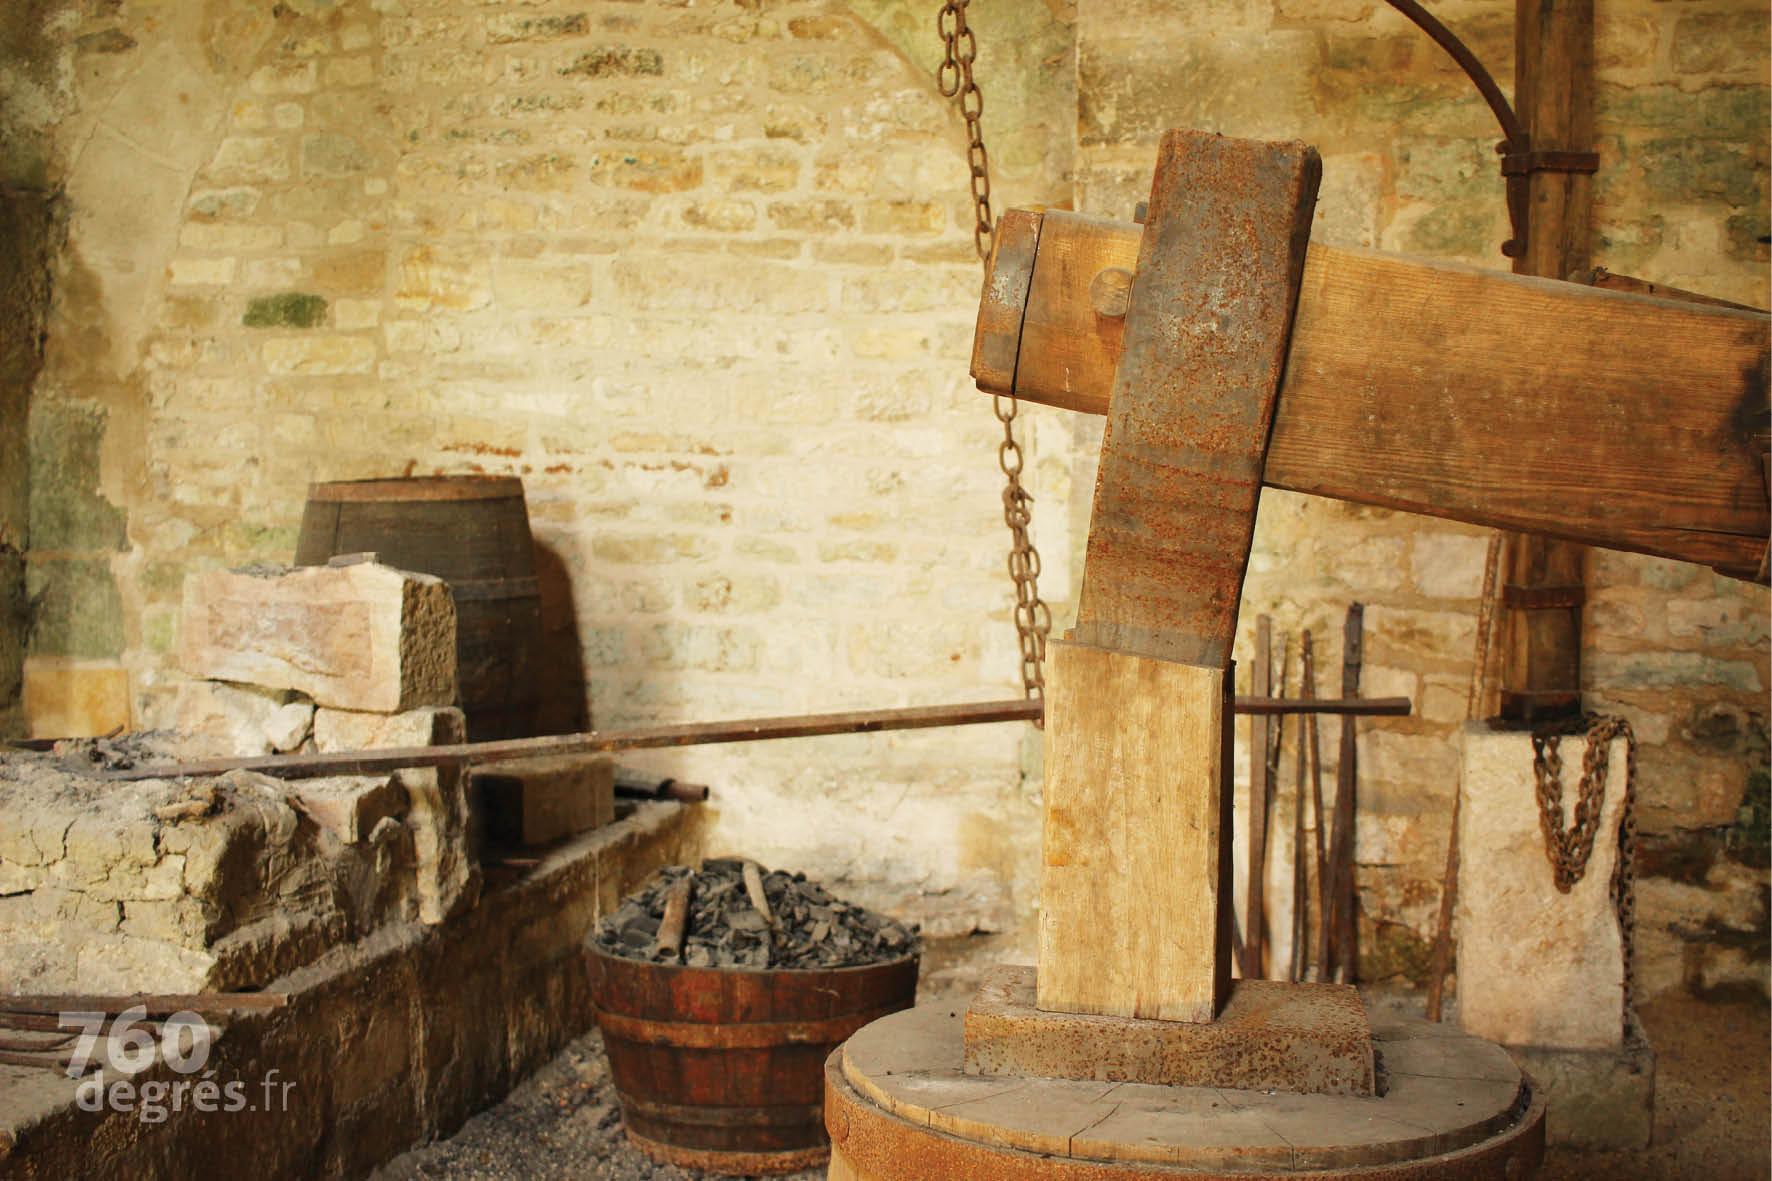 760degres-abbaye-fontenay-17